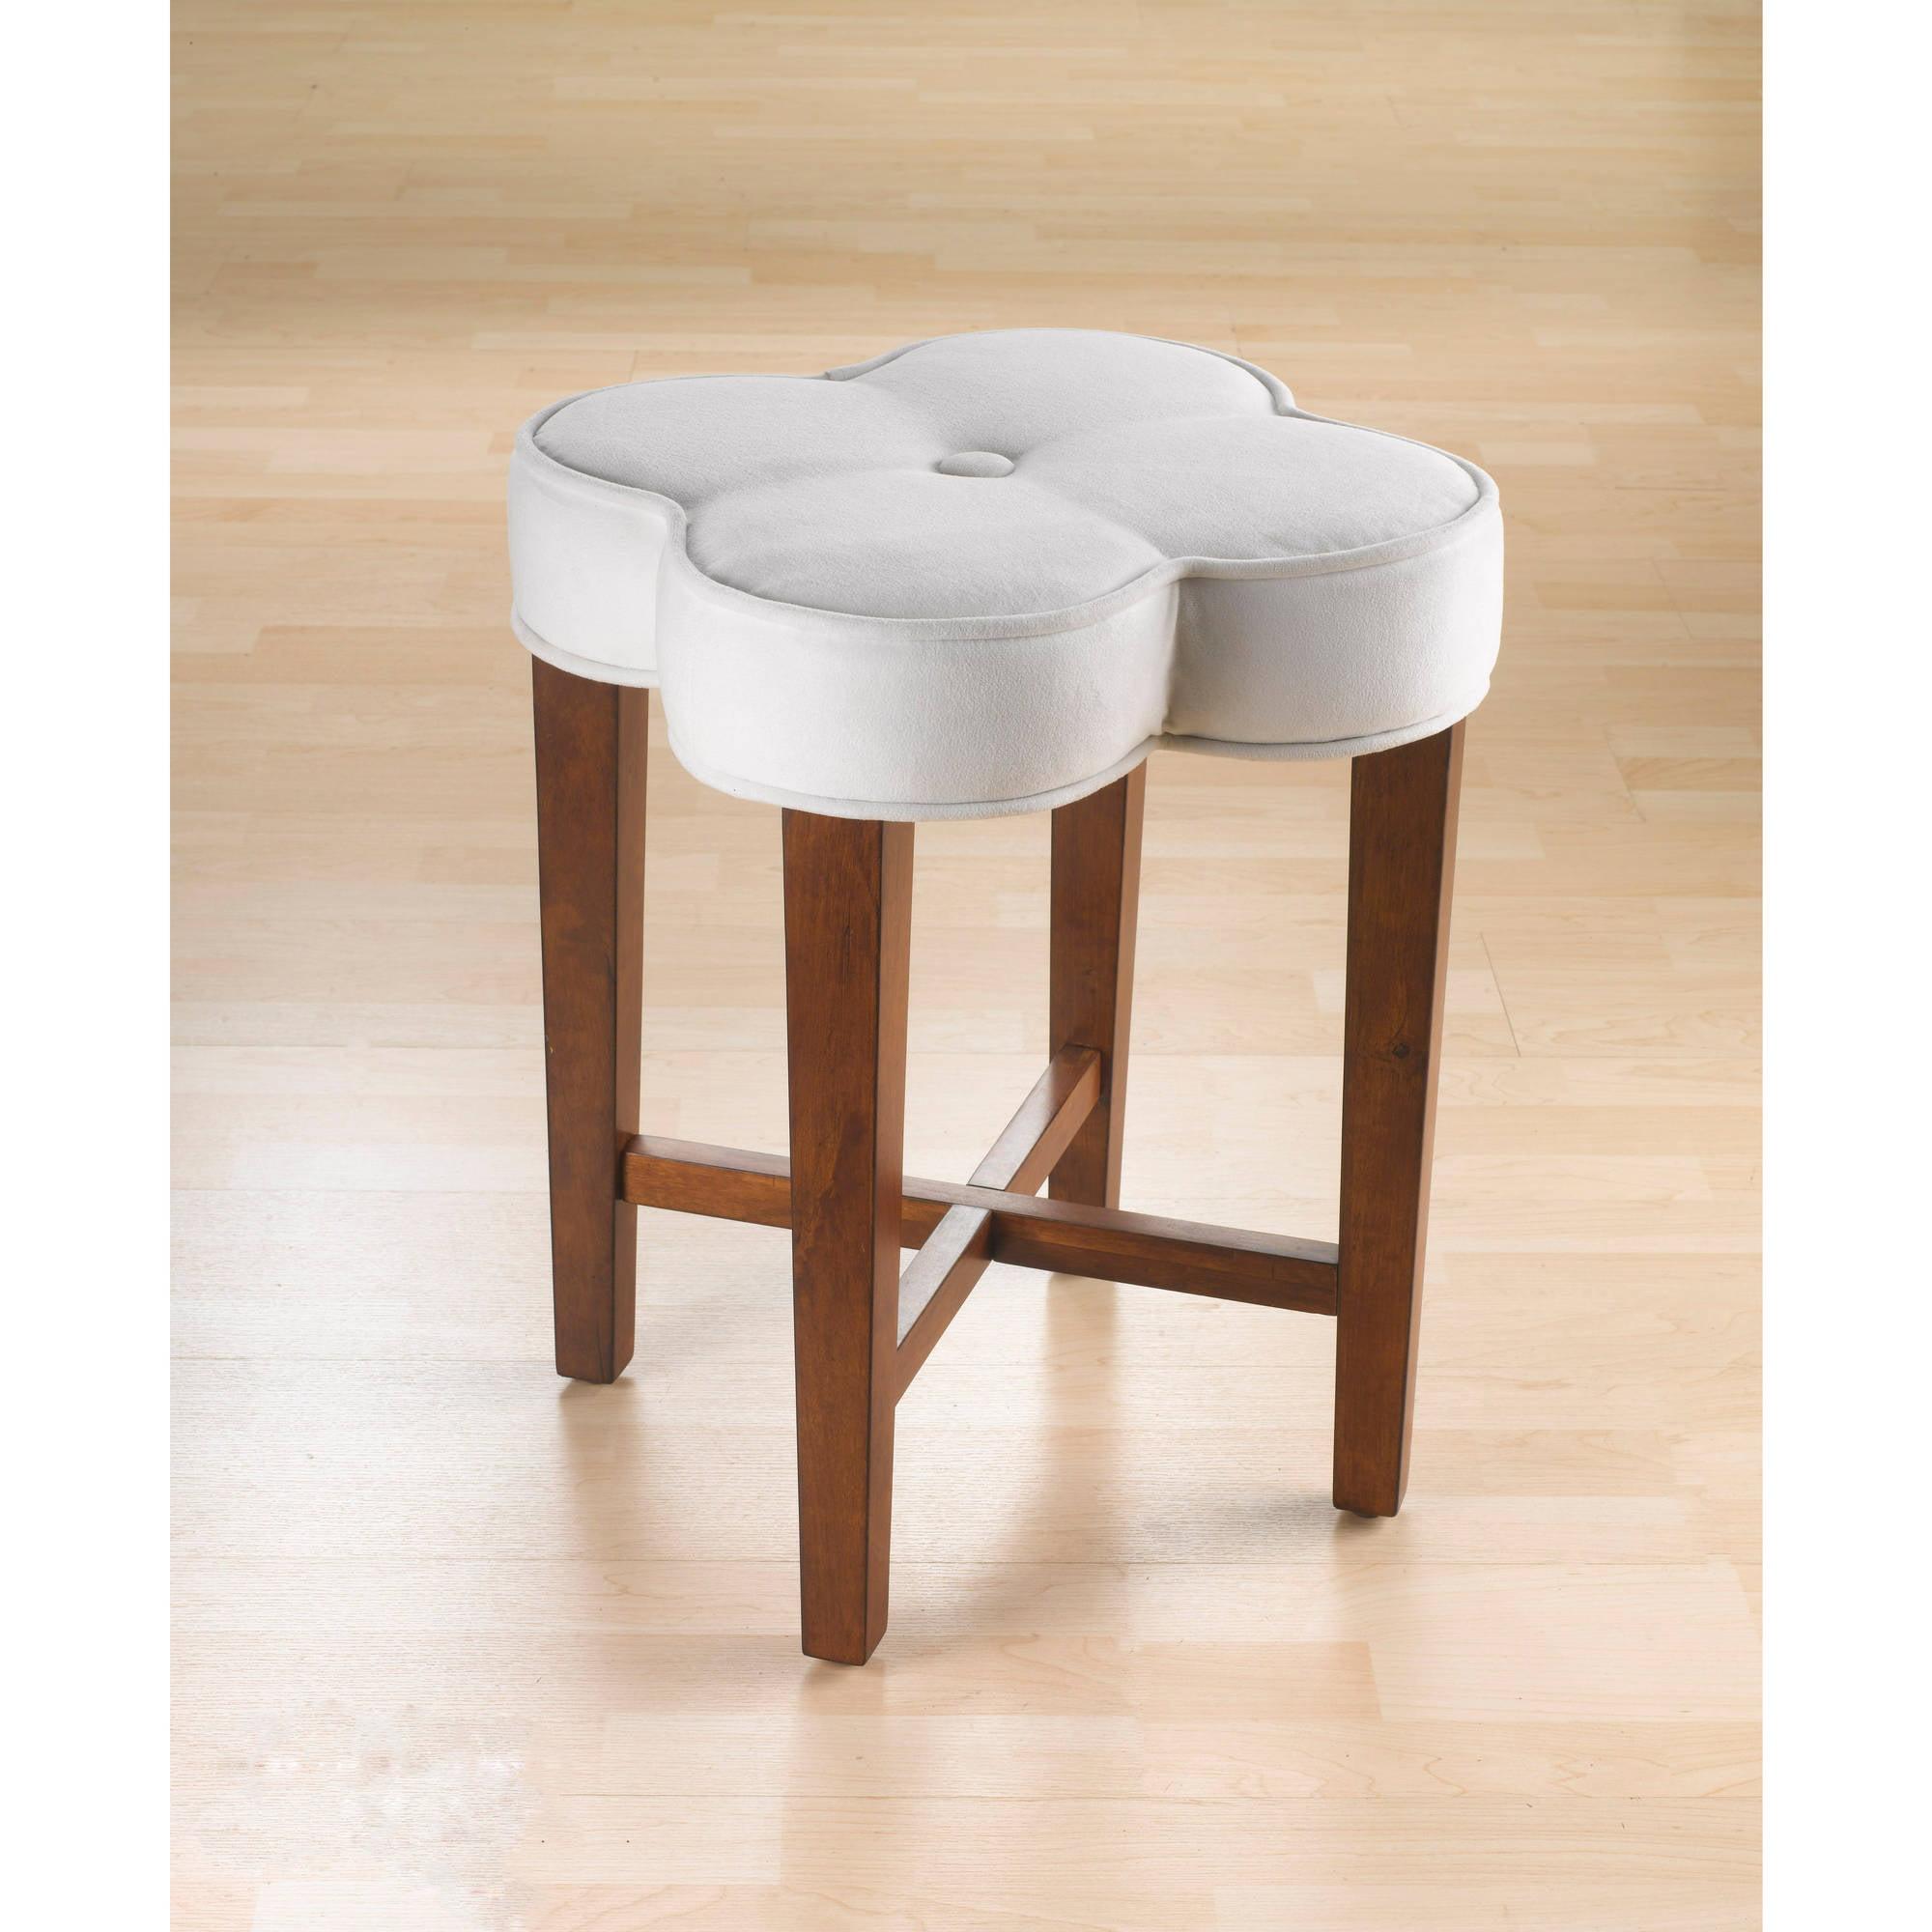 Hillsdale Furniture Clover Vanity Stool, Cherry   Walmart.com